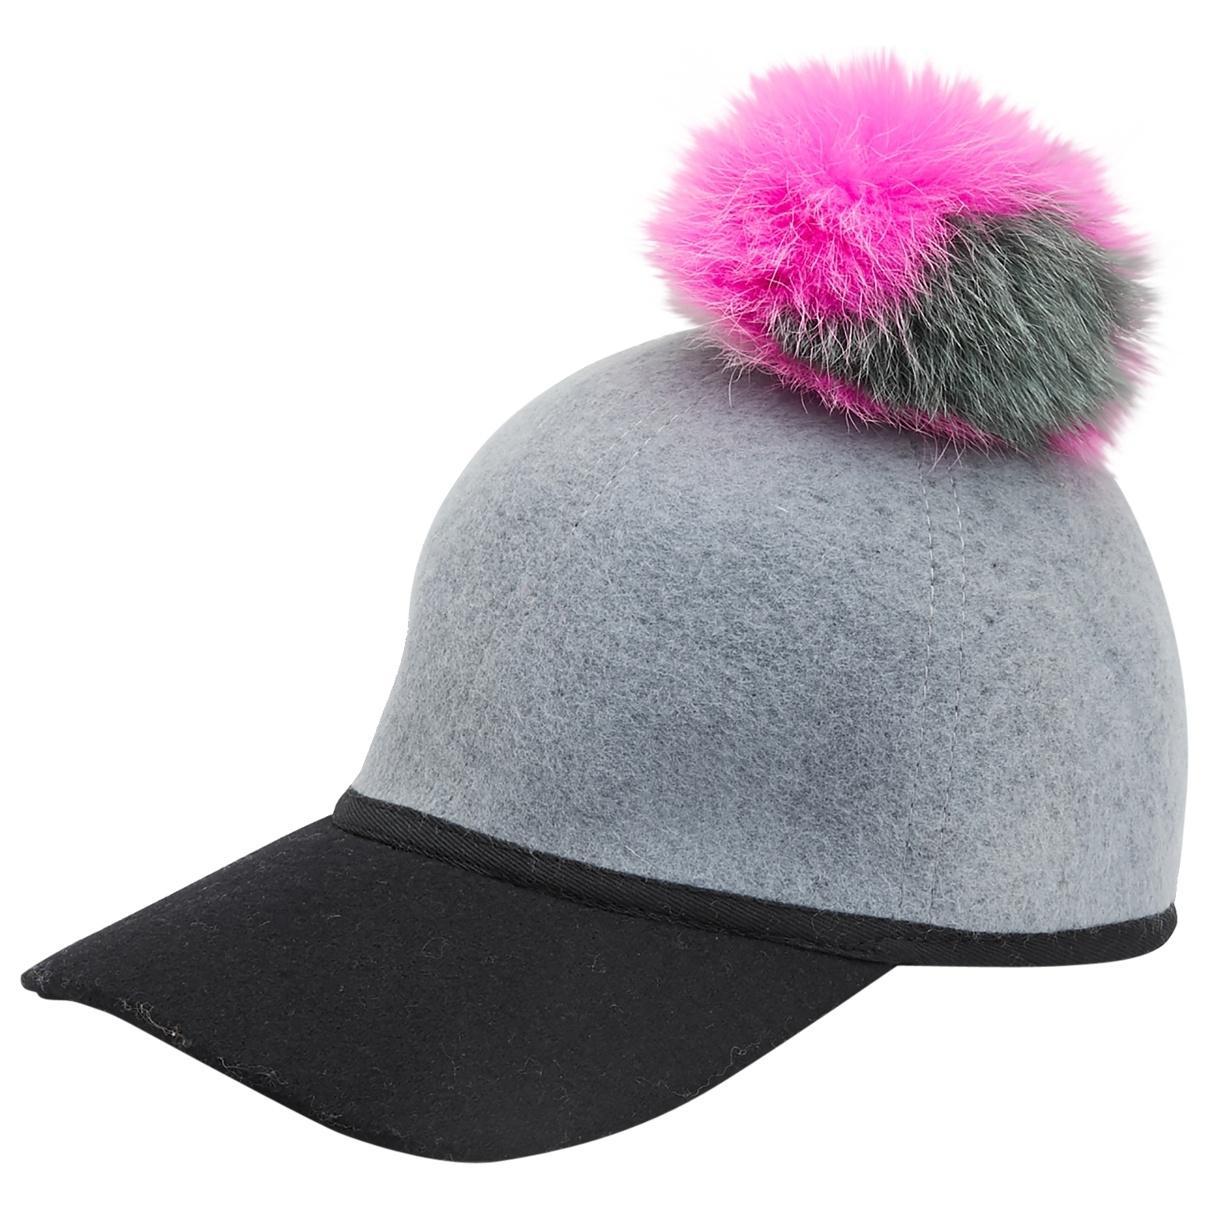 023265256ec Lyst - Charlotte Simone Pre-owned Grey Wool Hats in Gray